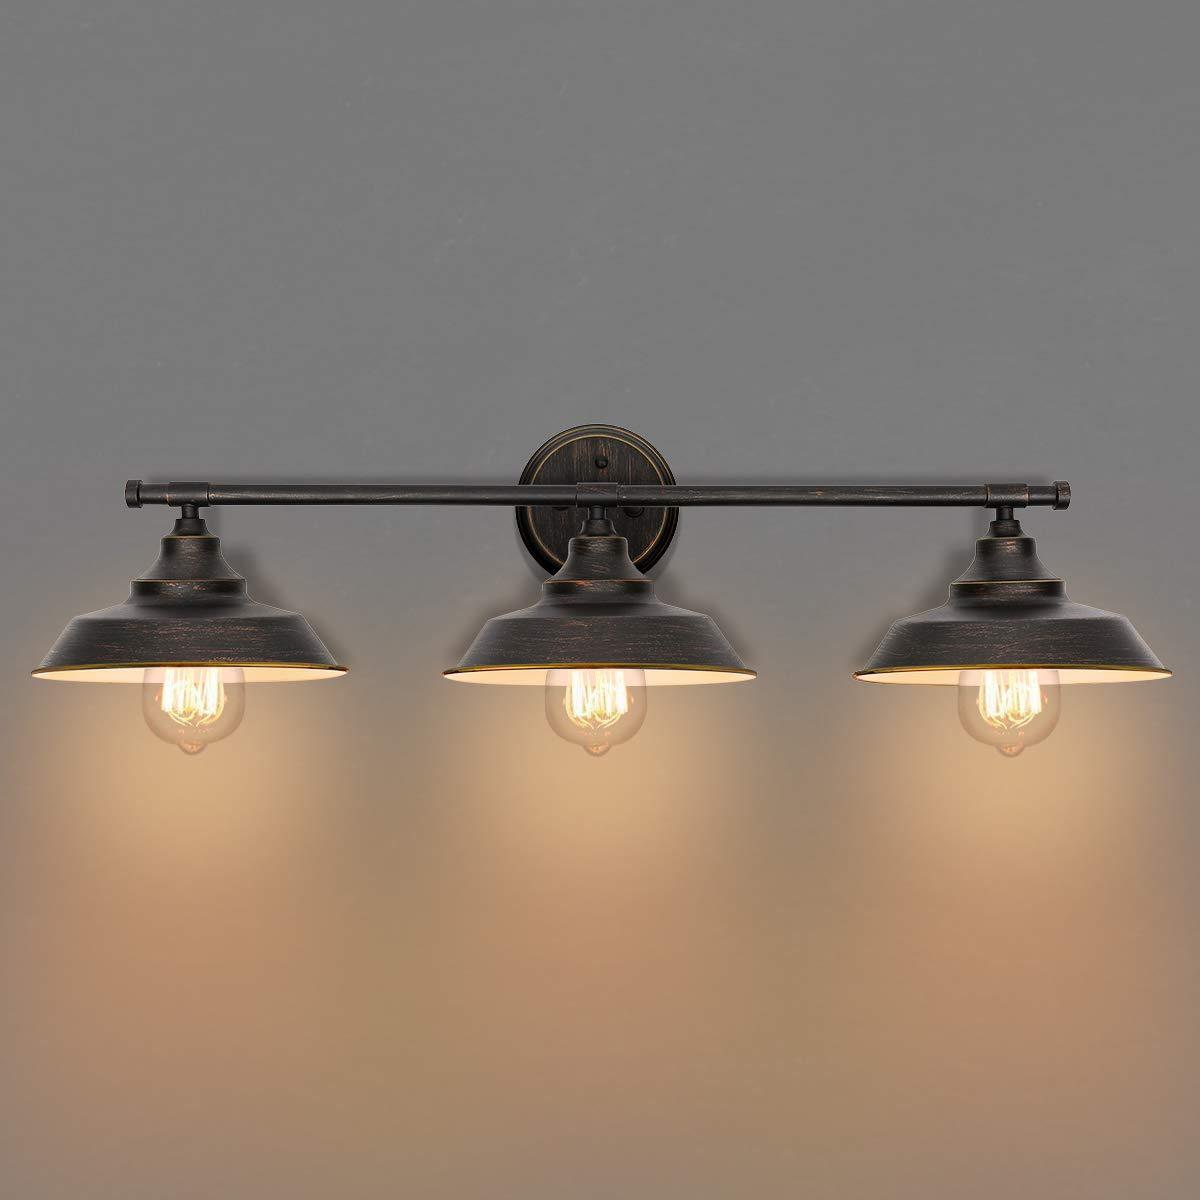 KingSo Bathroom Vanity Light 3 Light Wall Sconce Fixture Industrial Indoor Wall Mount Lamp Shade for Bathroom Kitchen Living Room Workshop Cafe